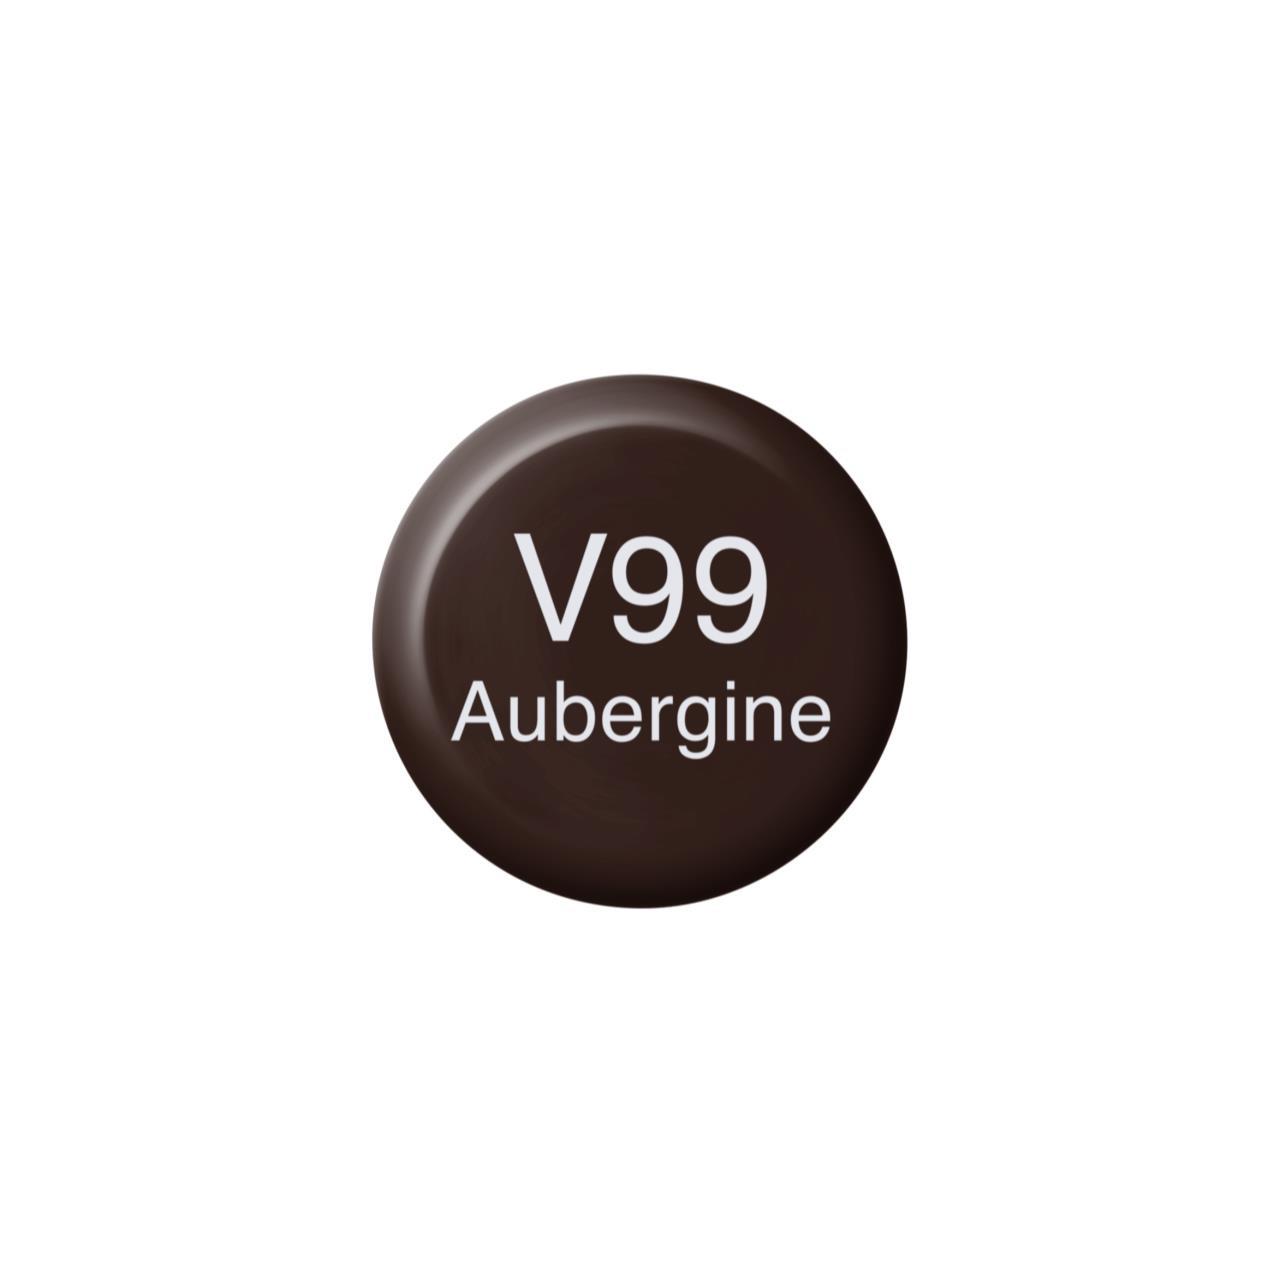 V99 Aubergine, Copic Ink - 4511338058121